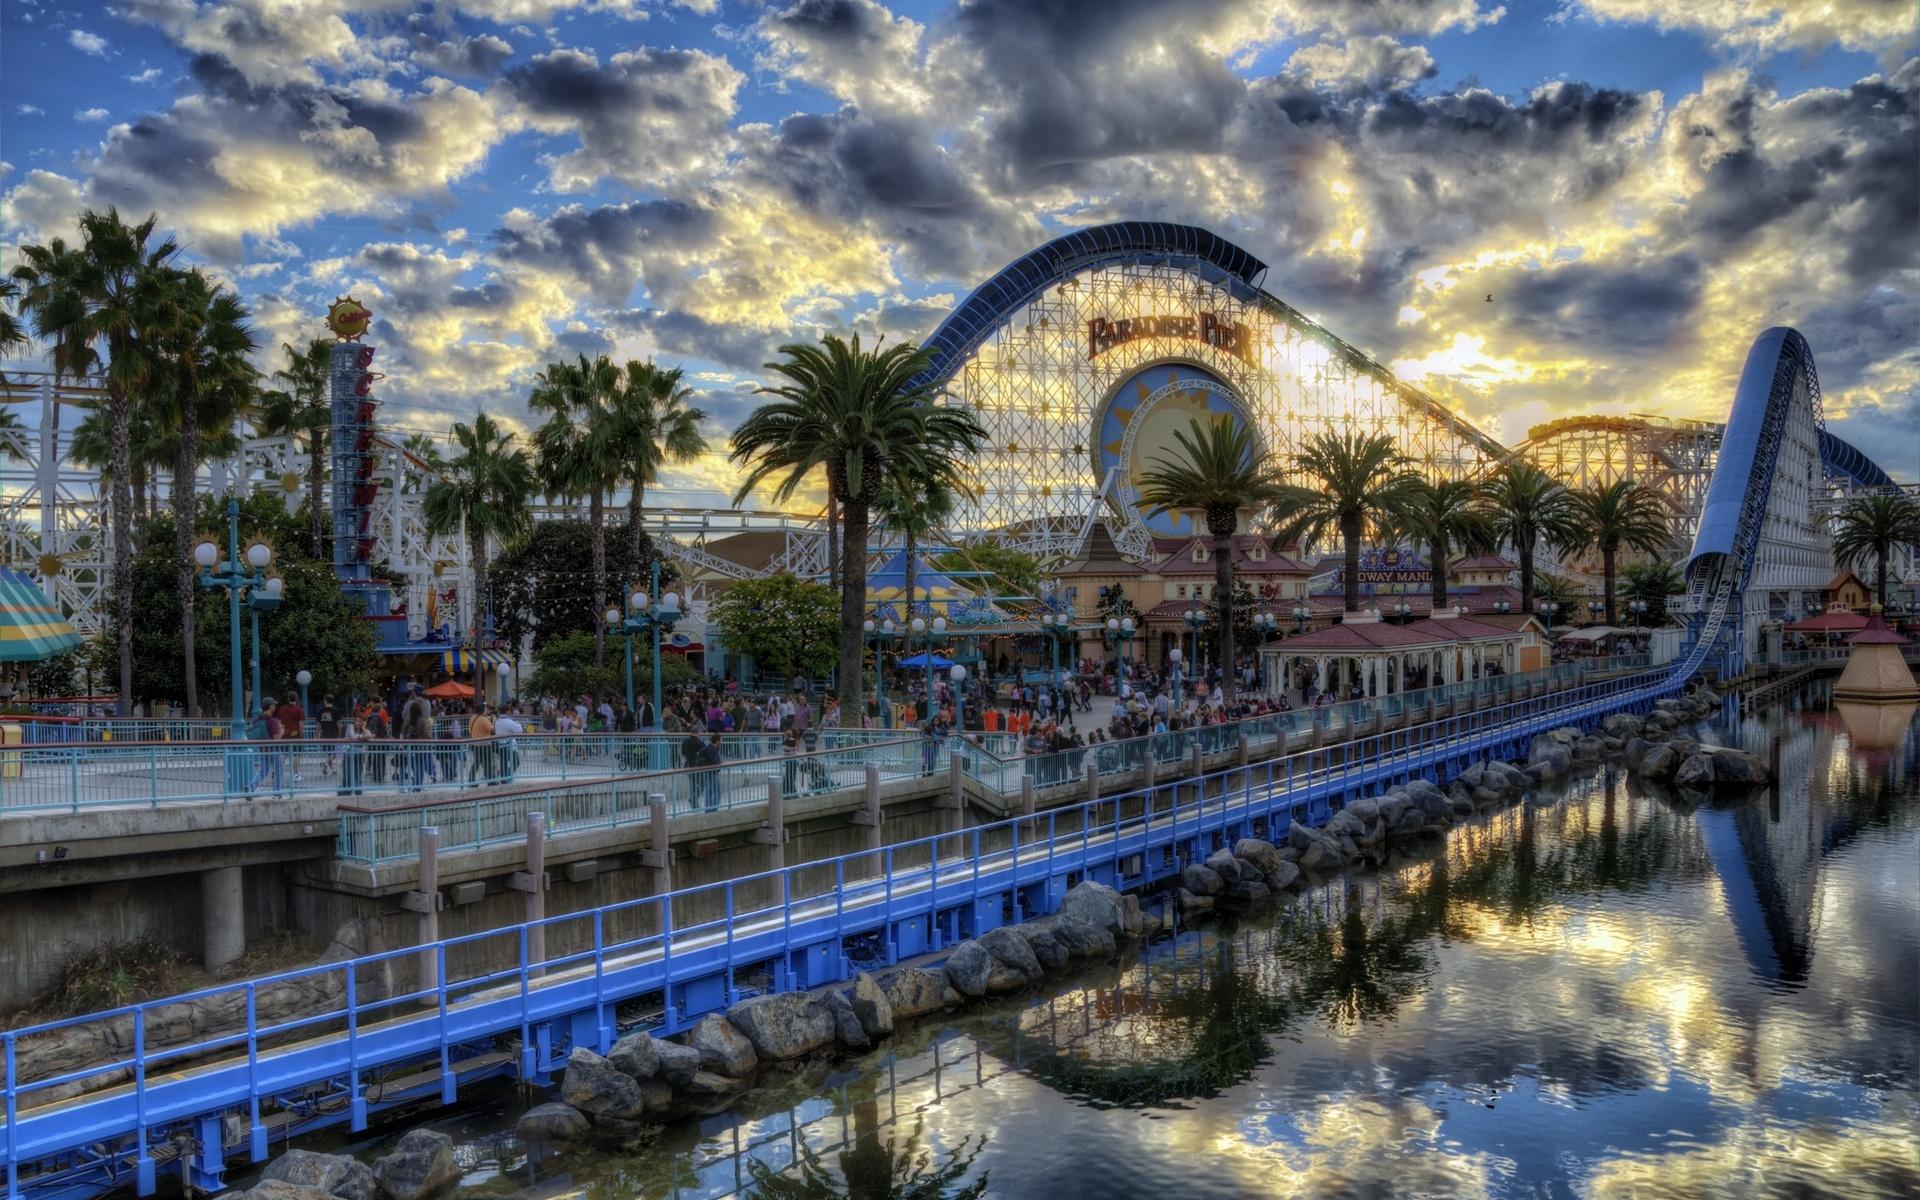 Amusement Park HD Wallpaper Background Image 1920x1200 ID 1920x1200